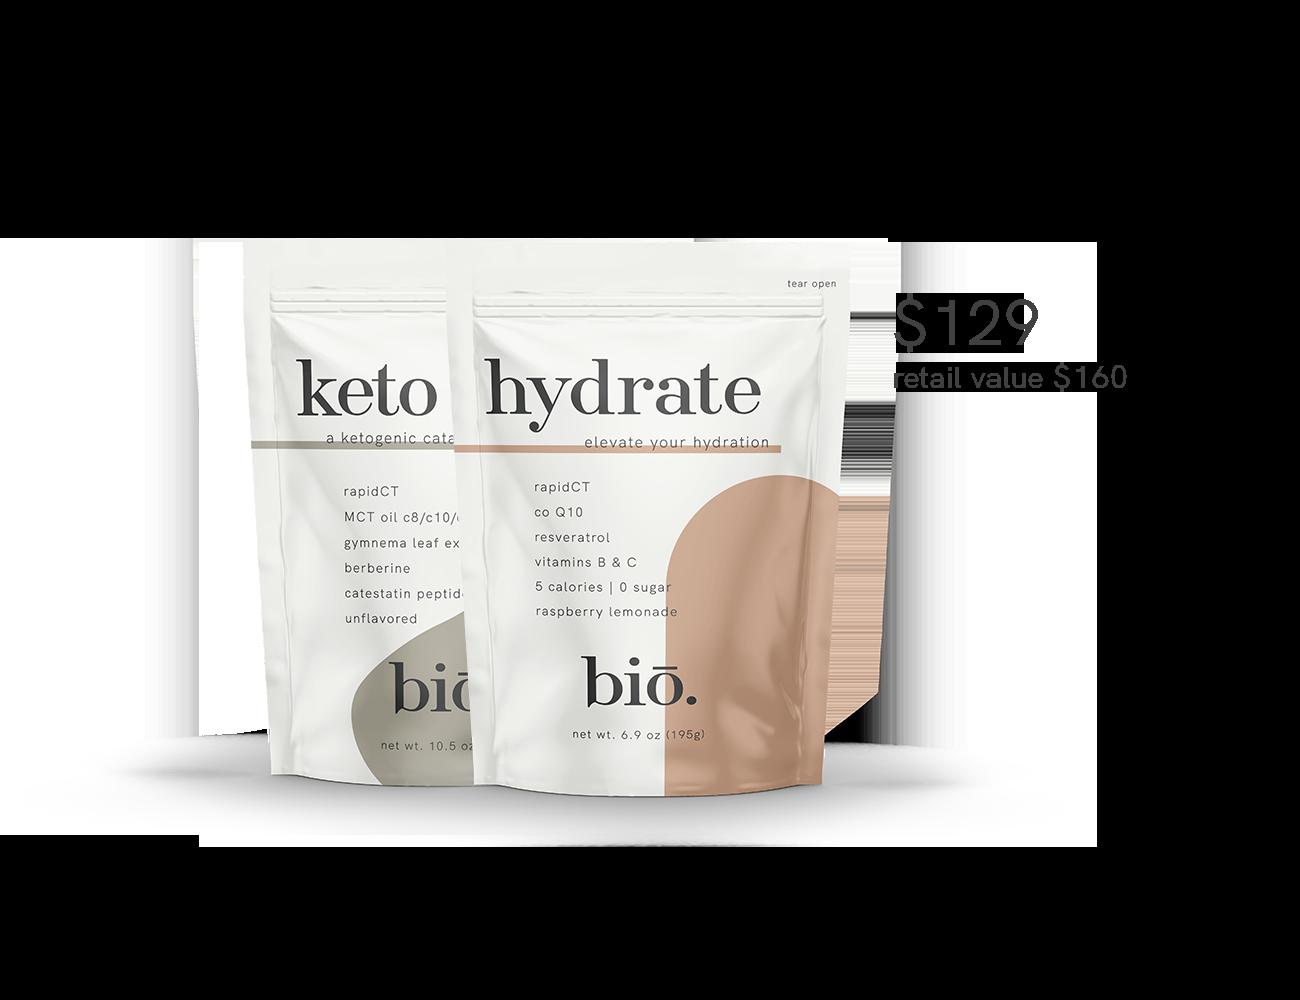 hydrate | keto pack